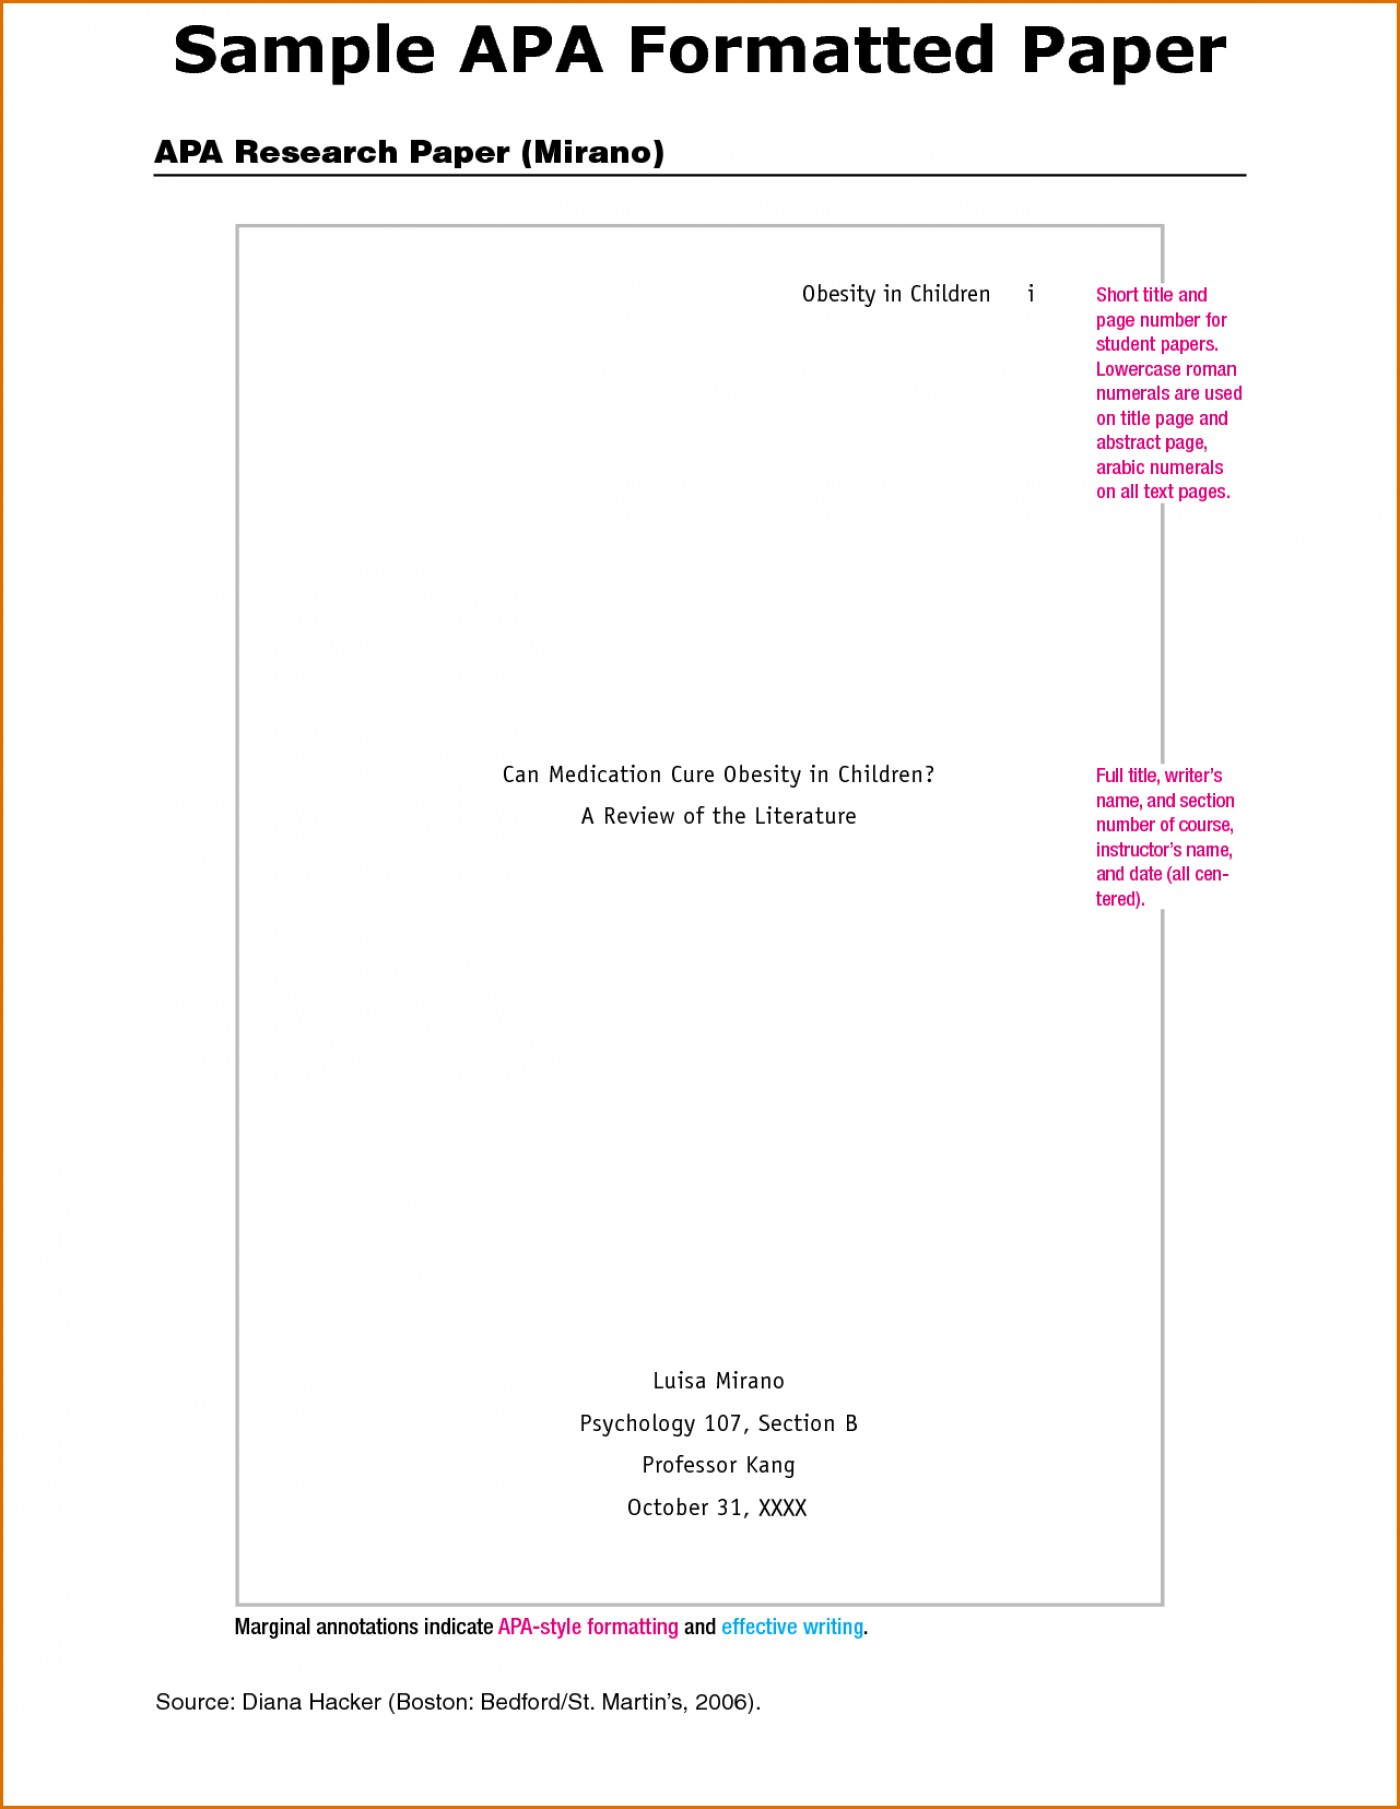 006 Apa Paper Template Iztn6rys Essay Example Stupendous Format Title Page Sample Pdf 2017 1400